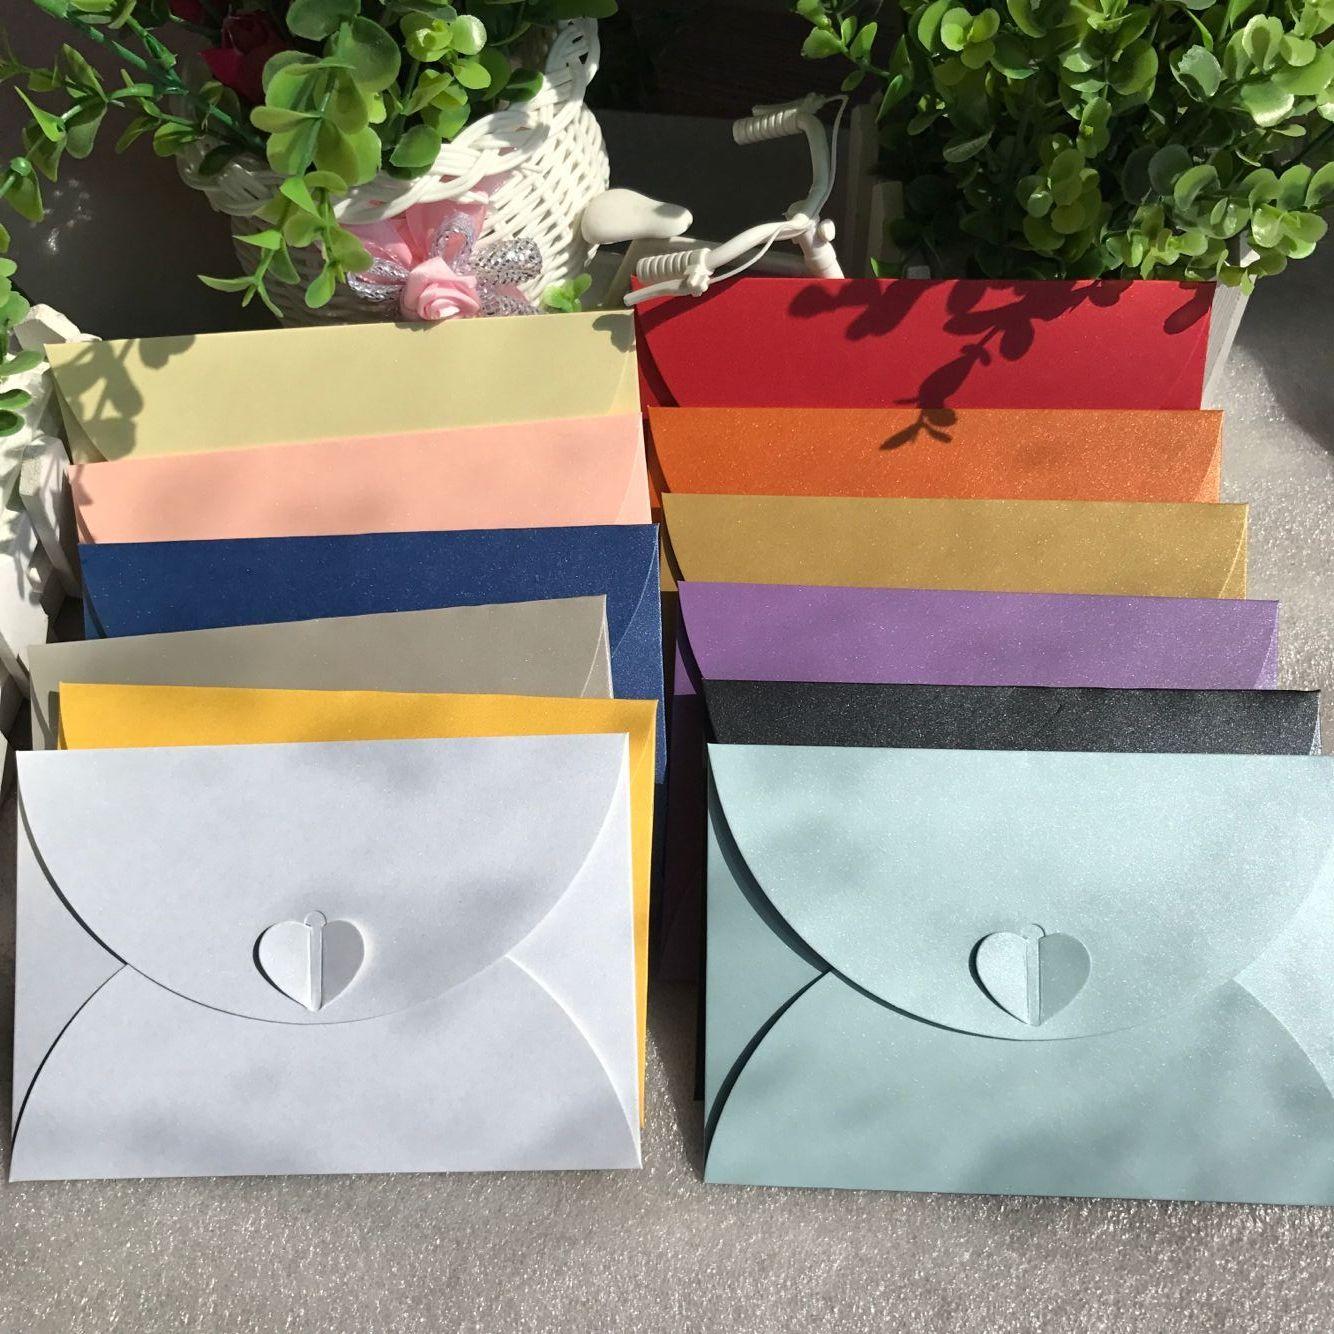 50pcs/set Envelopes For Invitations Weeding Envelope 17.5*11cm(1inch=2.54cm) Paper Envelopes Wedding Invitation Envelope